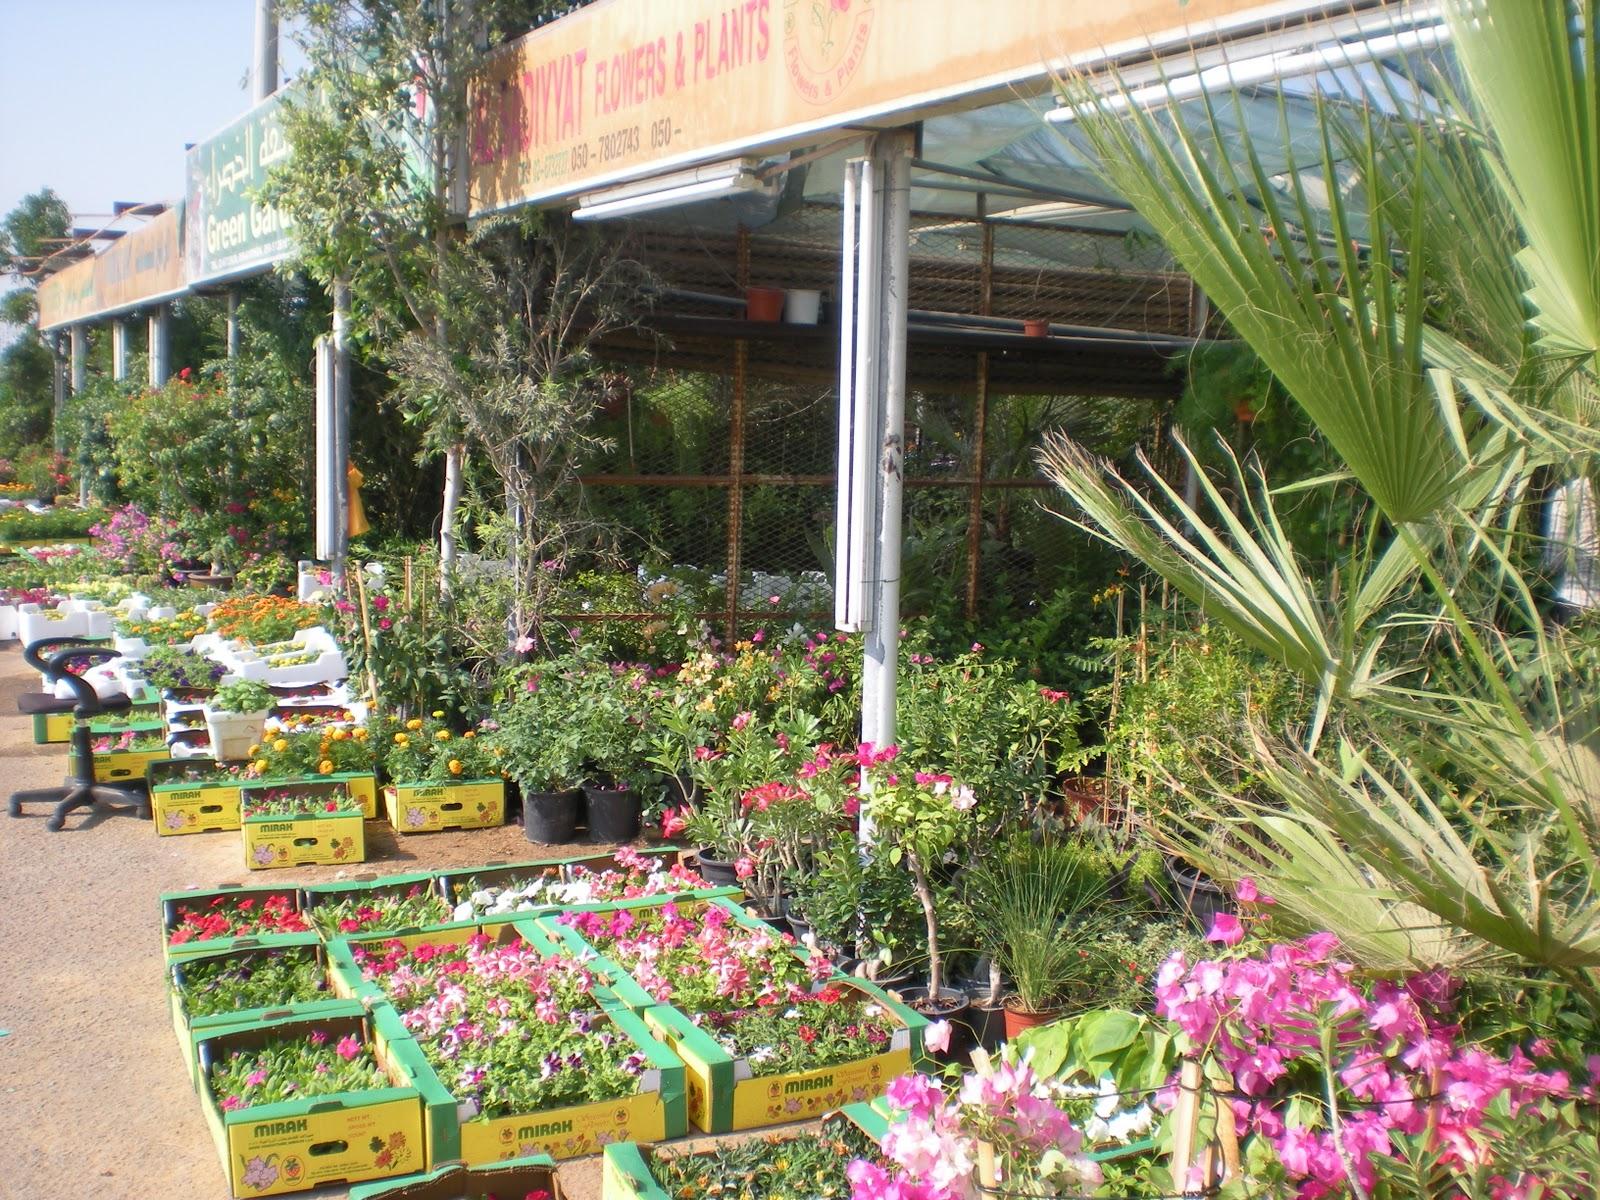 Nick's Garden: seeking plants in the souk – Writing to Inform